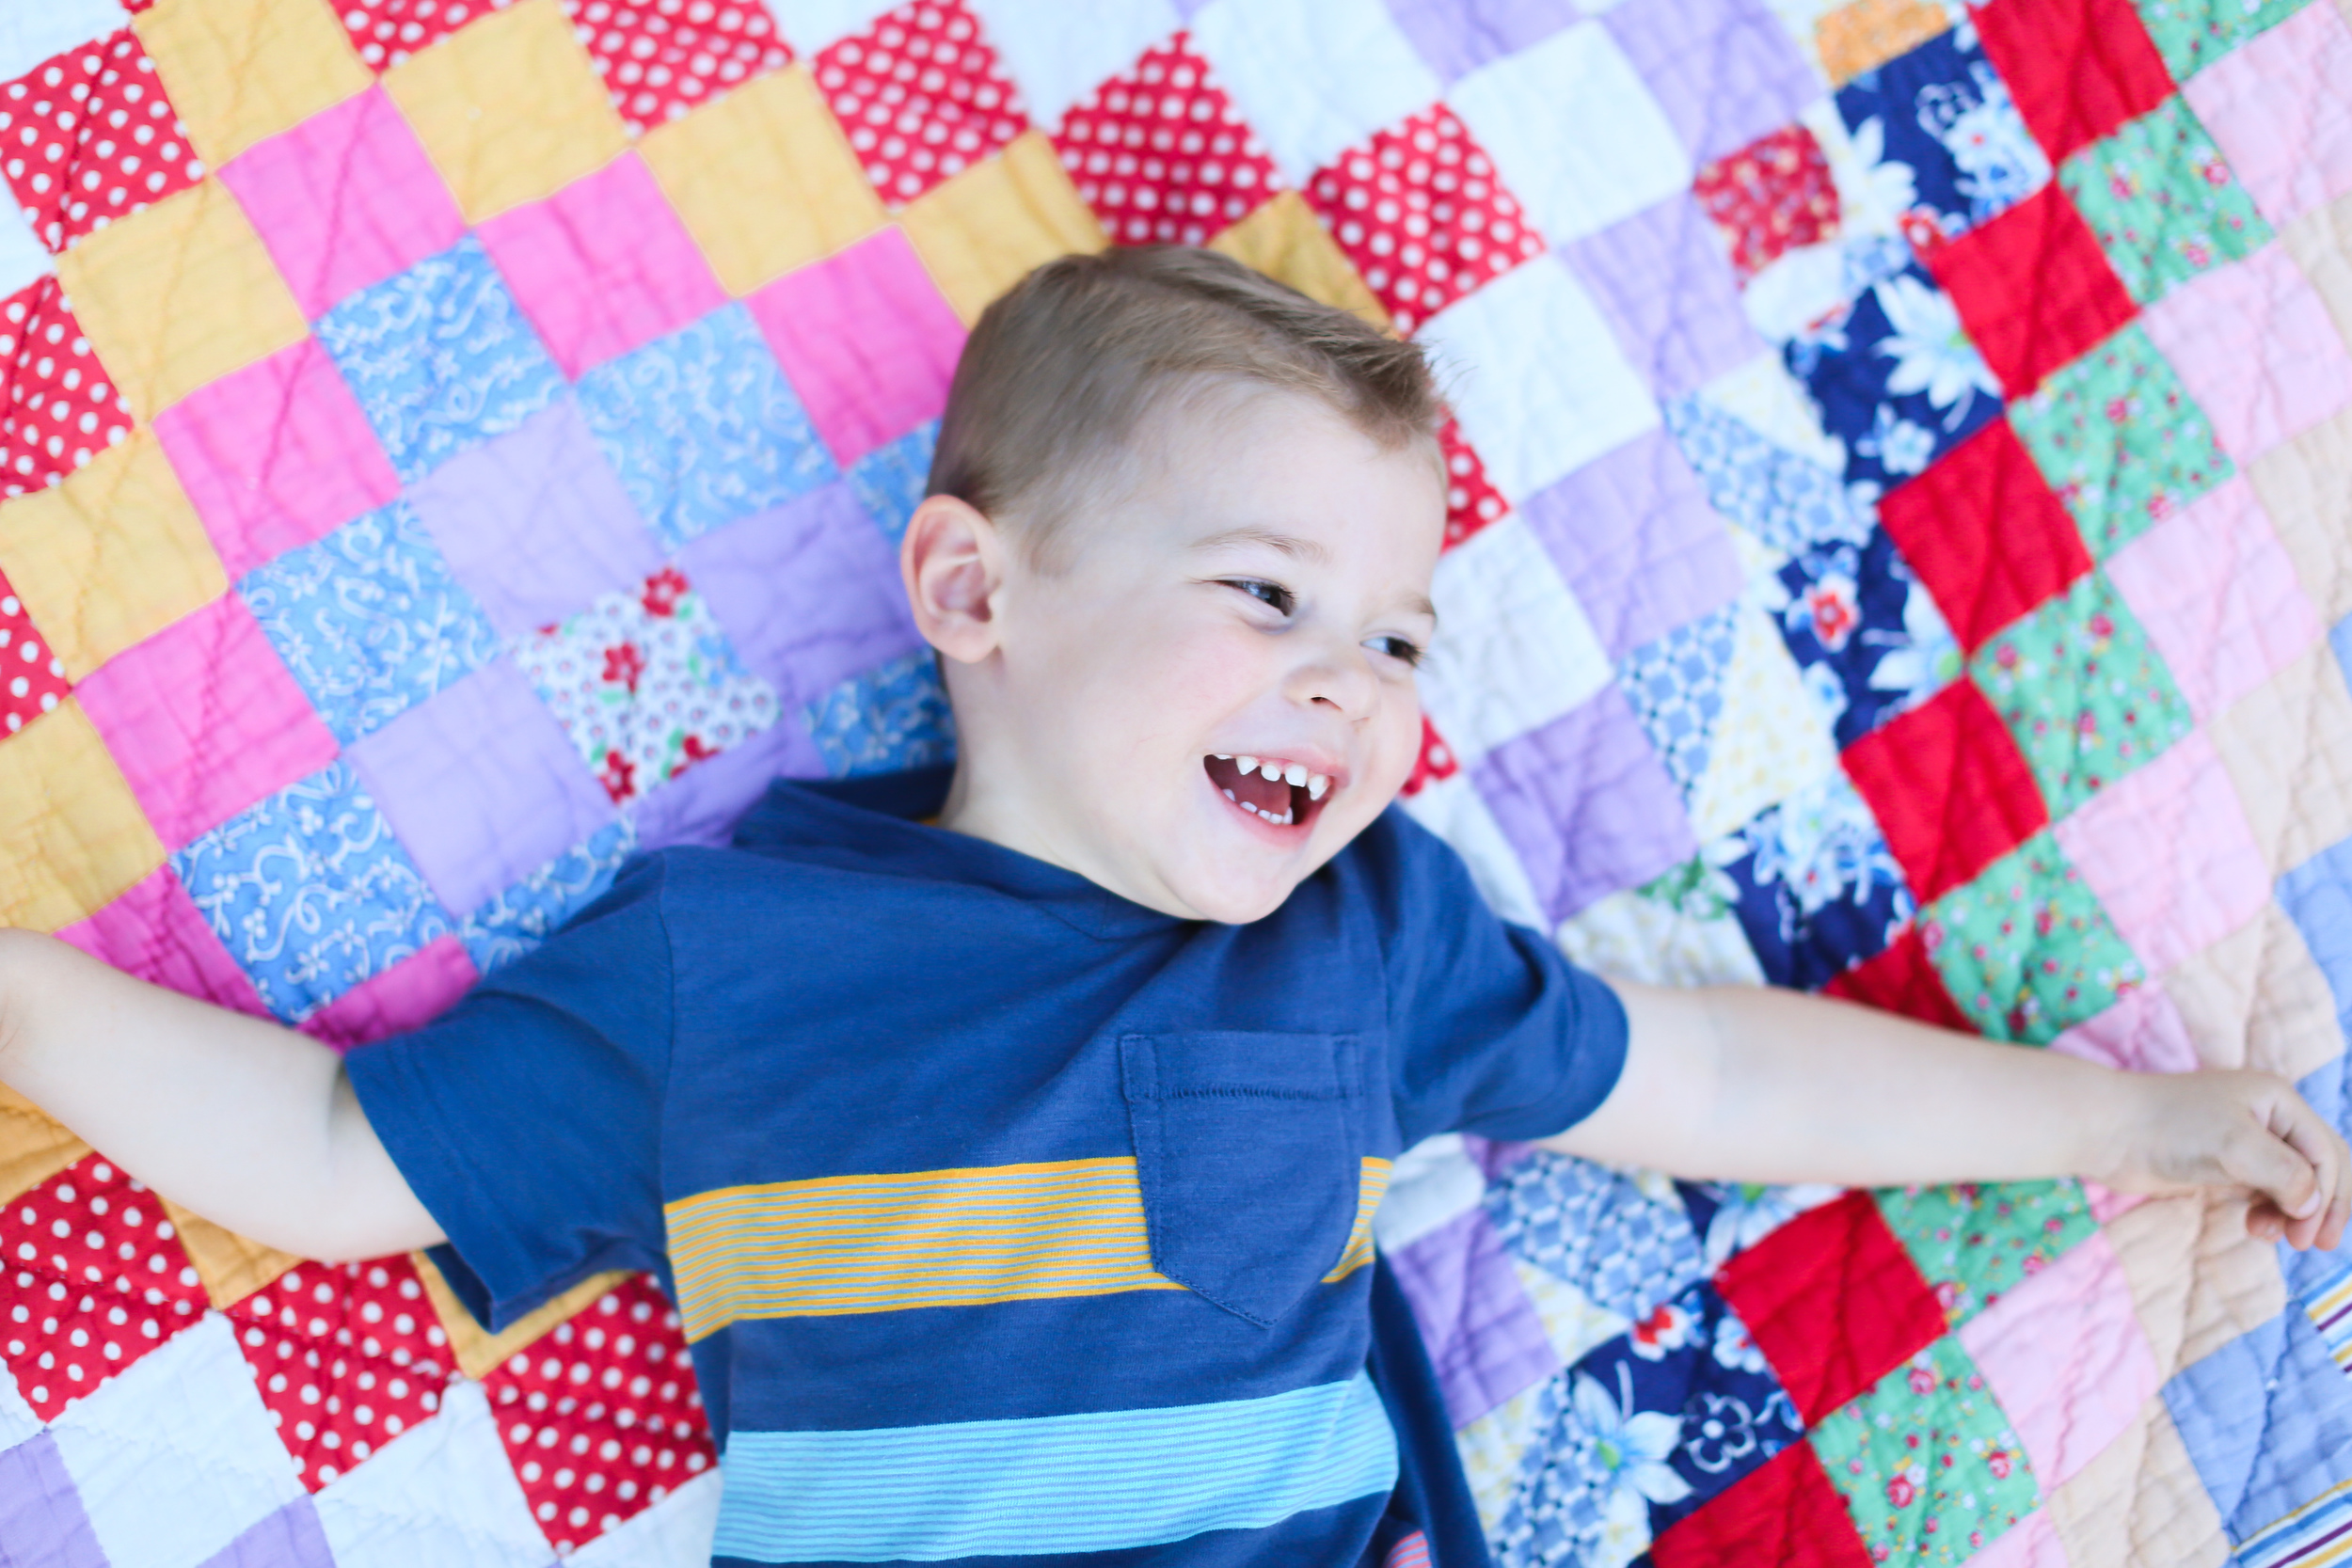 chicago toddler boy laugh